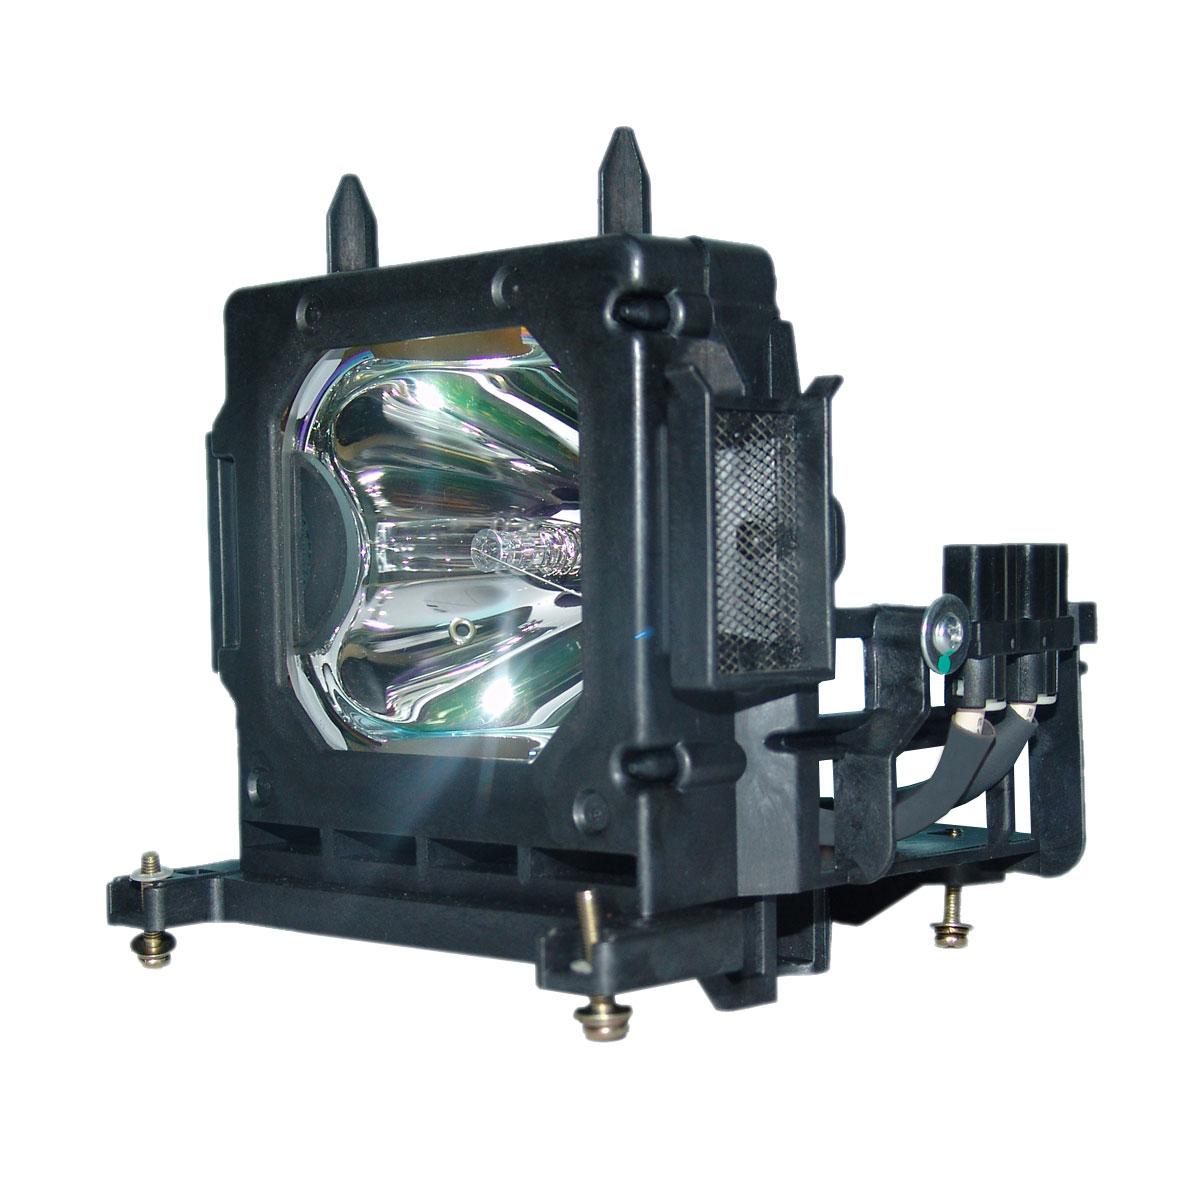 Sony LMP-H201 FP Lamp